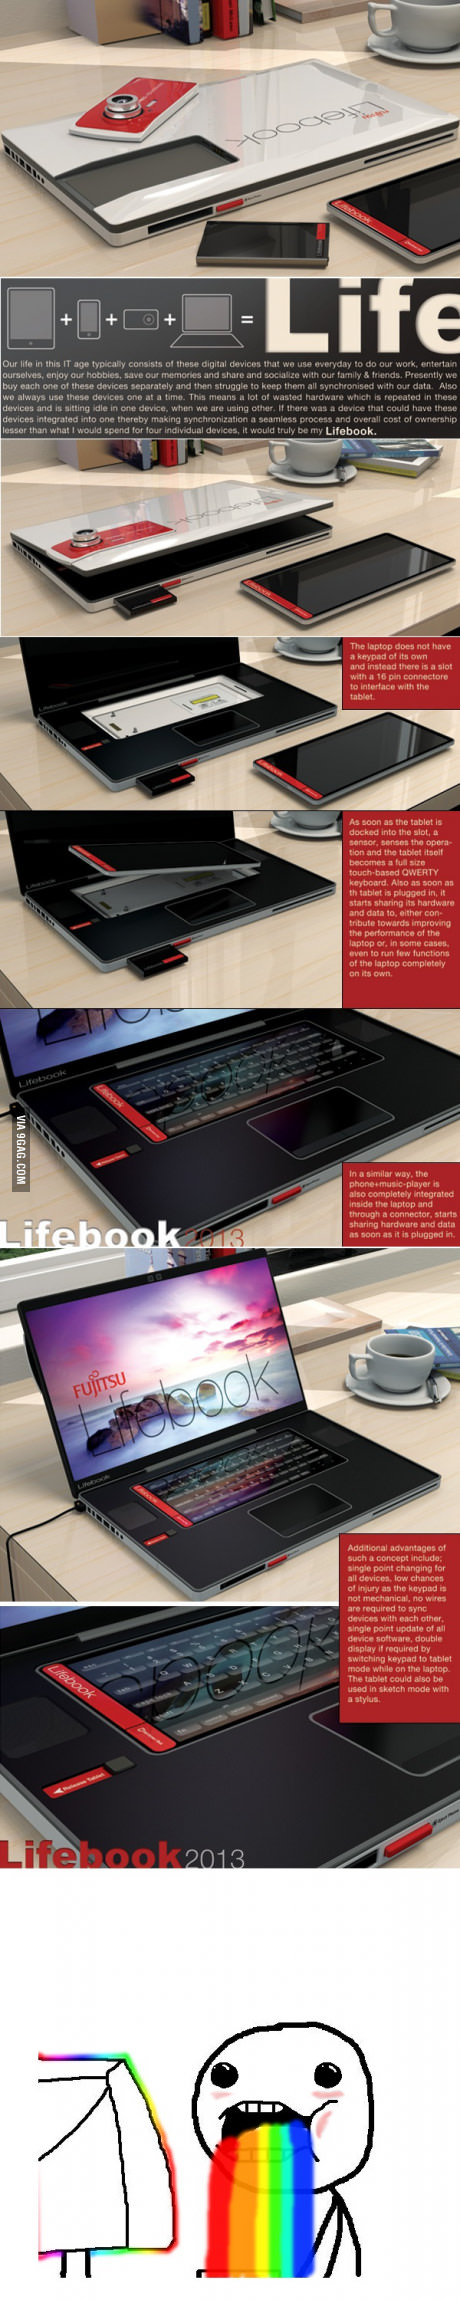 Fujitsu Lifebook 2013.. wait.. what?